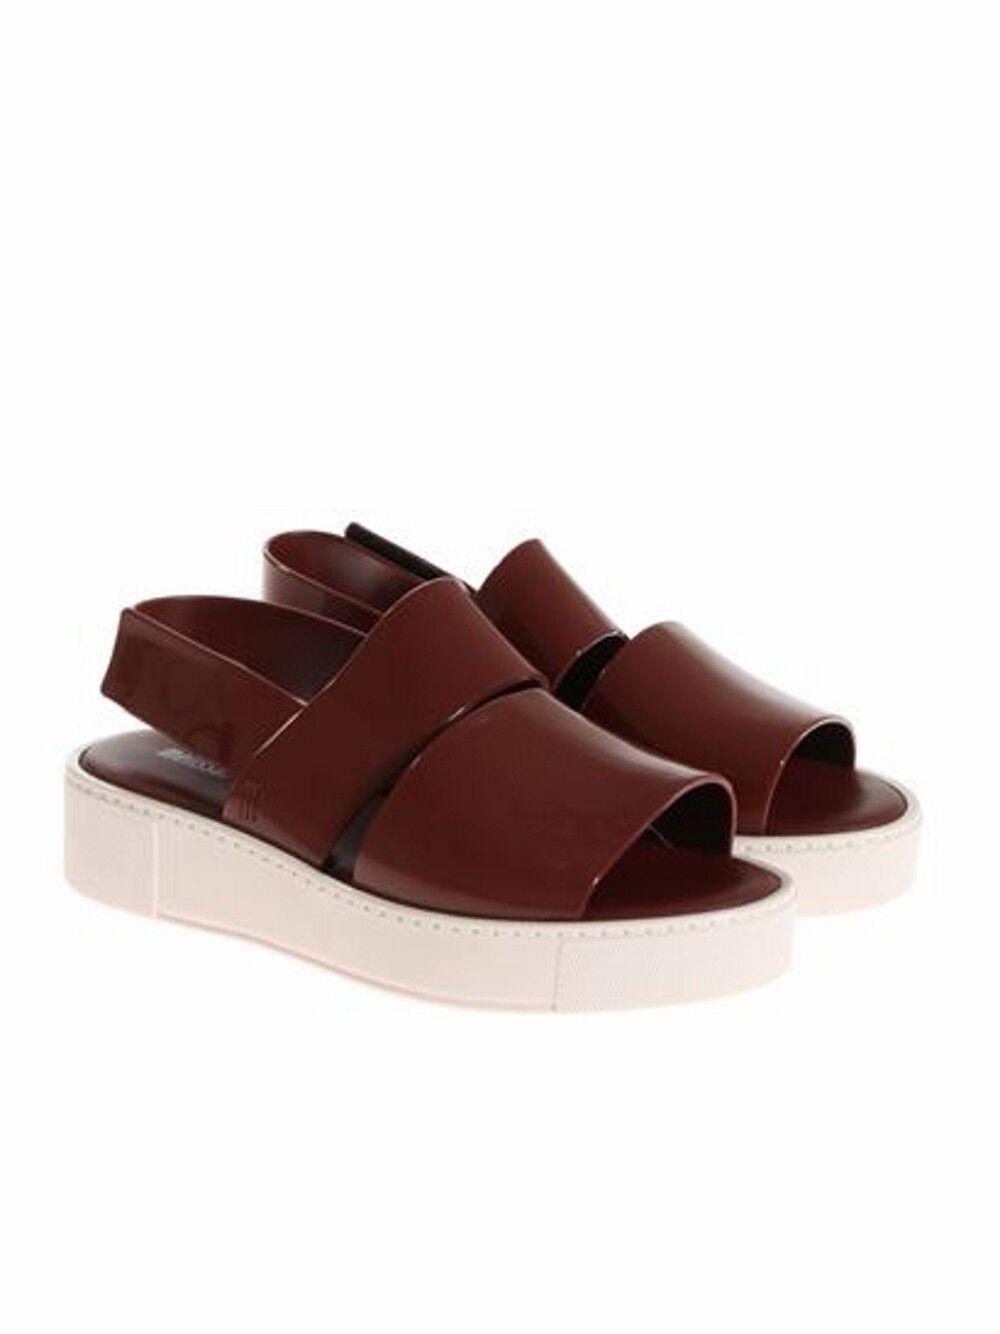 Melissa Sandalo soho, Soho sandals brown brown sandals ace888